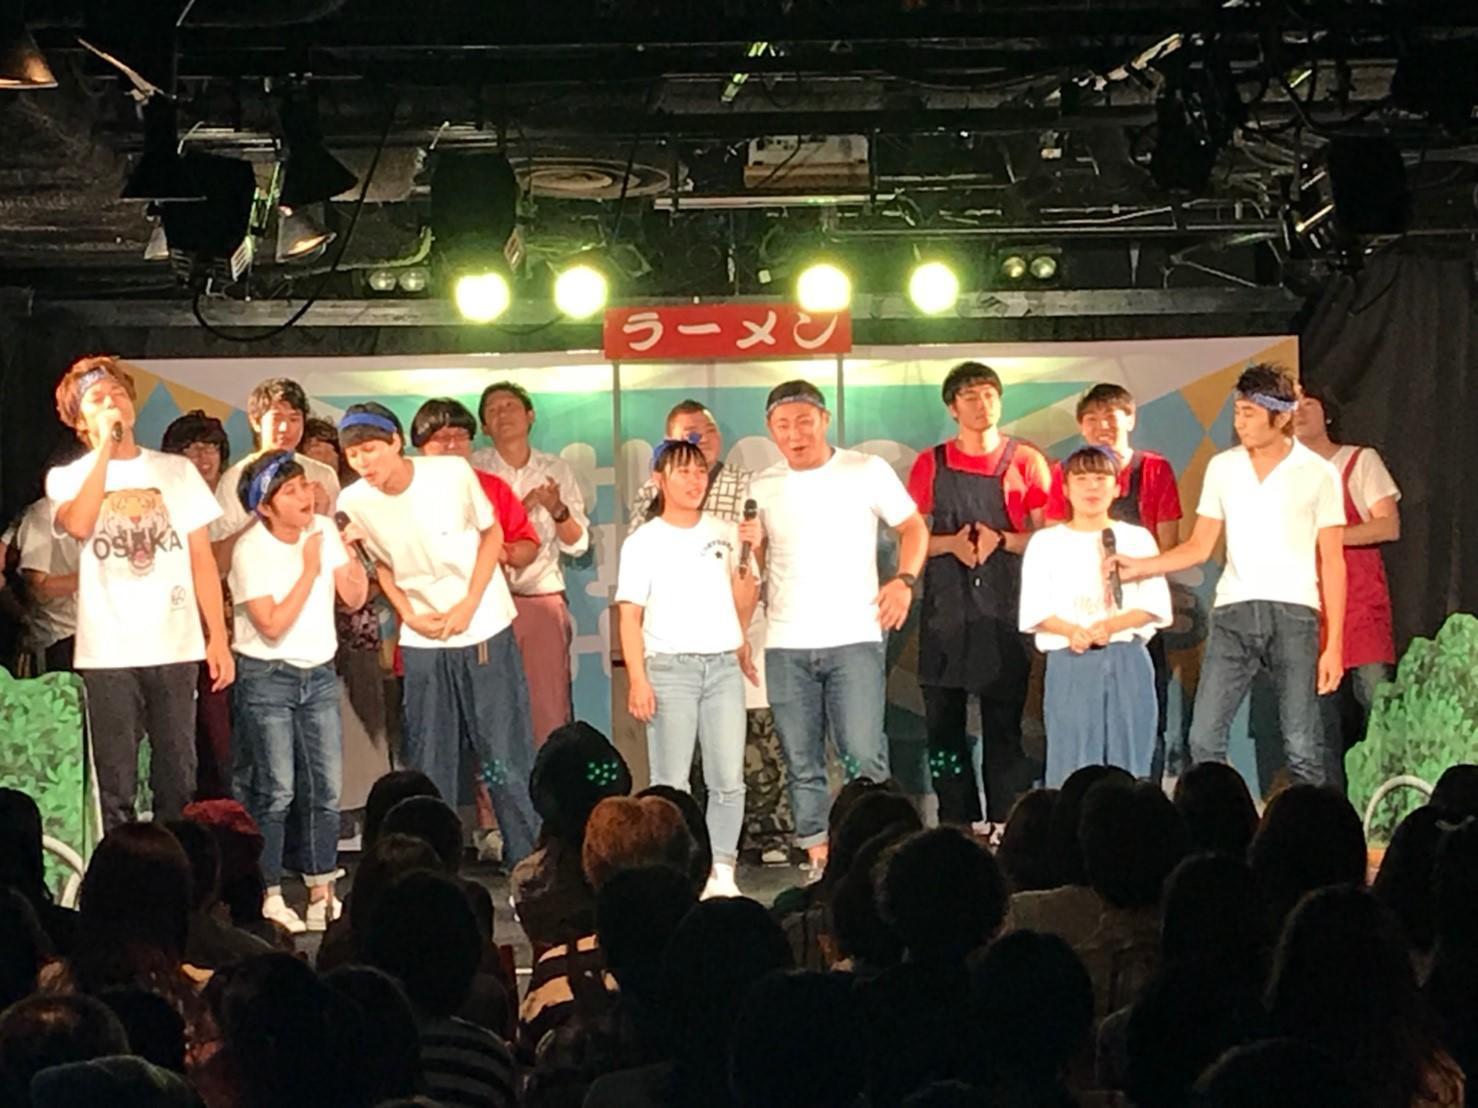 http://news.yoshimoto.co.jp/20181006175015-5251ffc125f624e872e8d68780290d878ab1016d.jpg